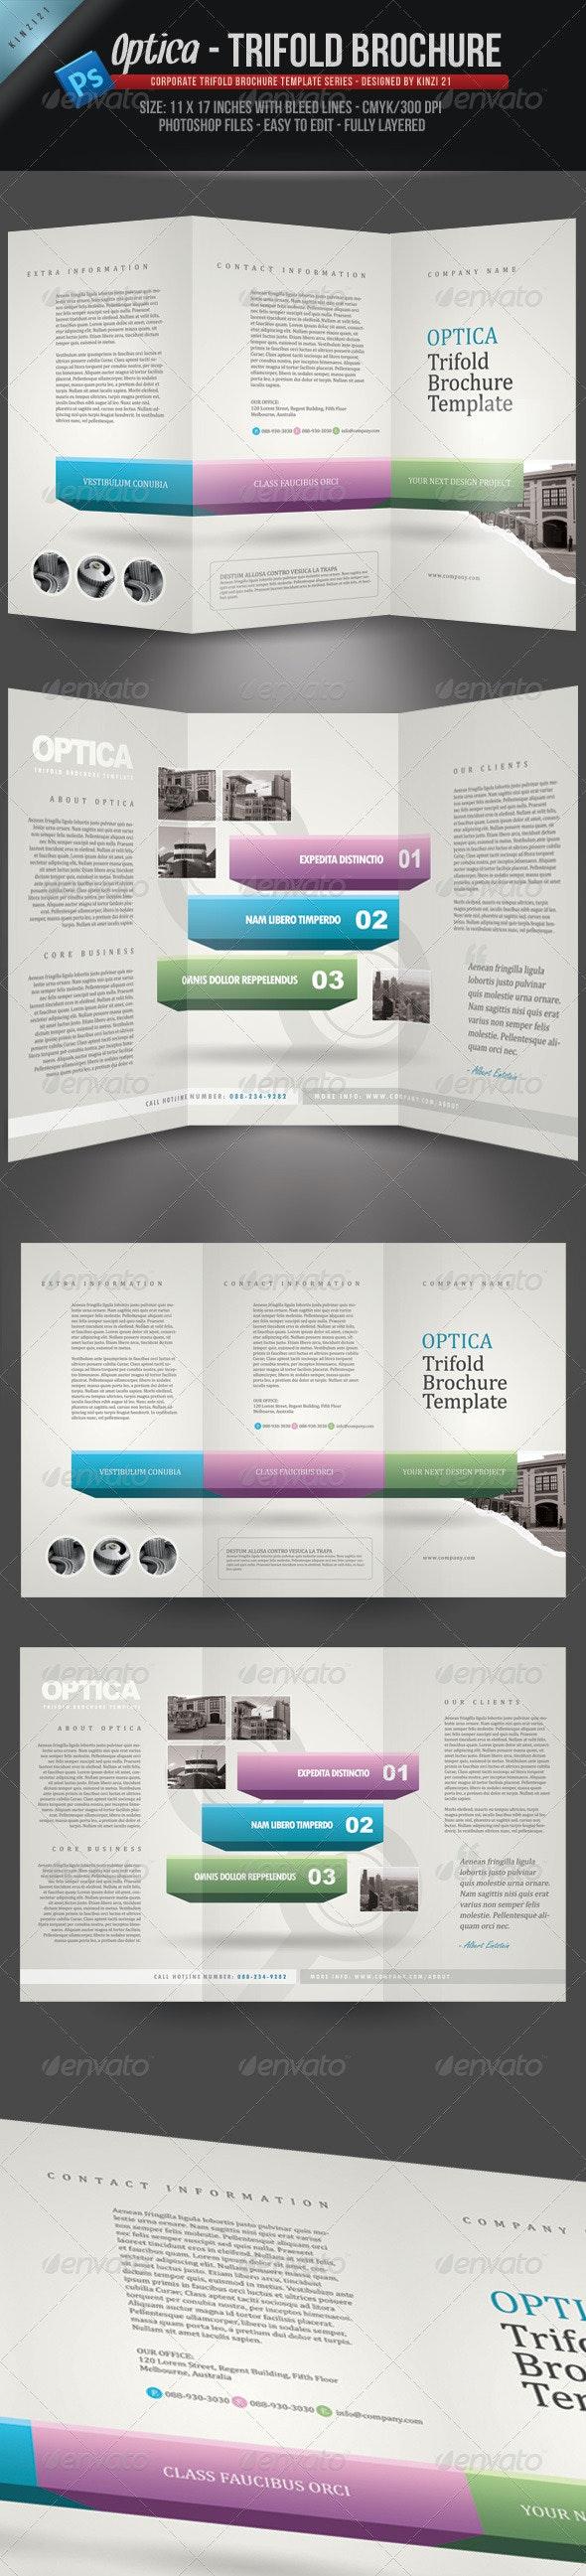 Optica Trifold Brochure Template - Corporate Brochures